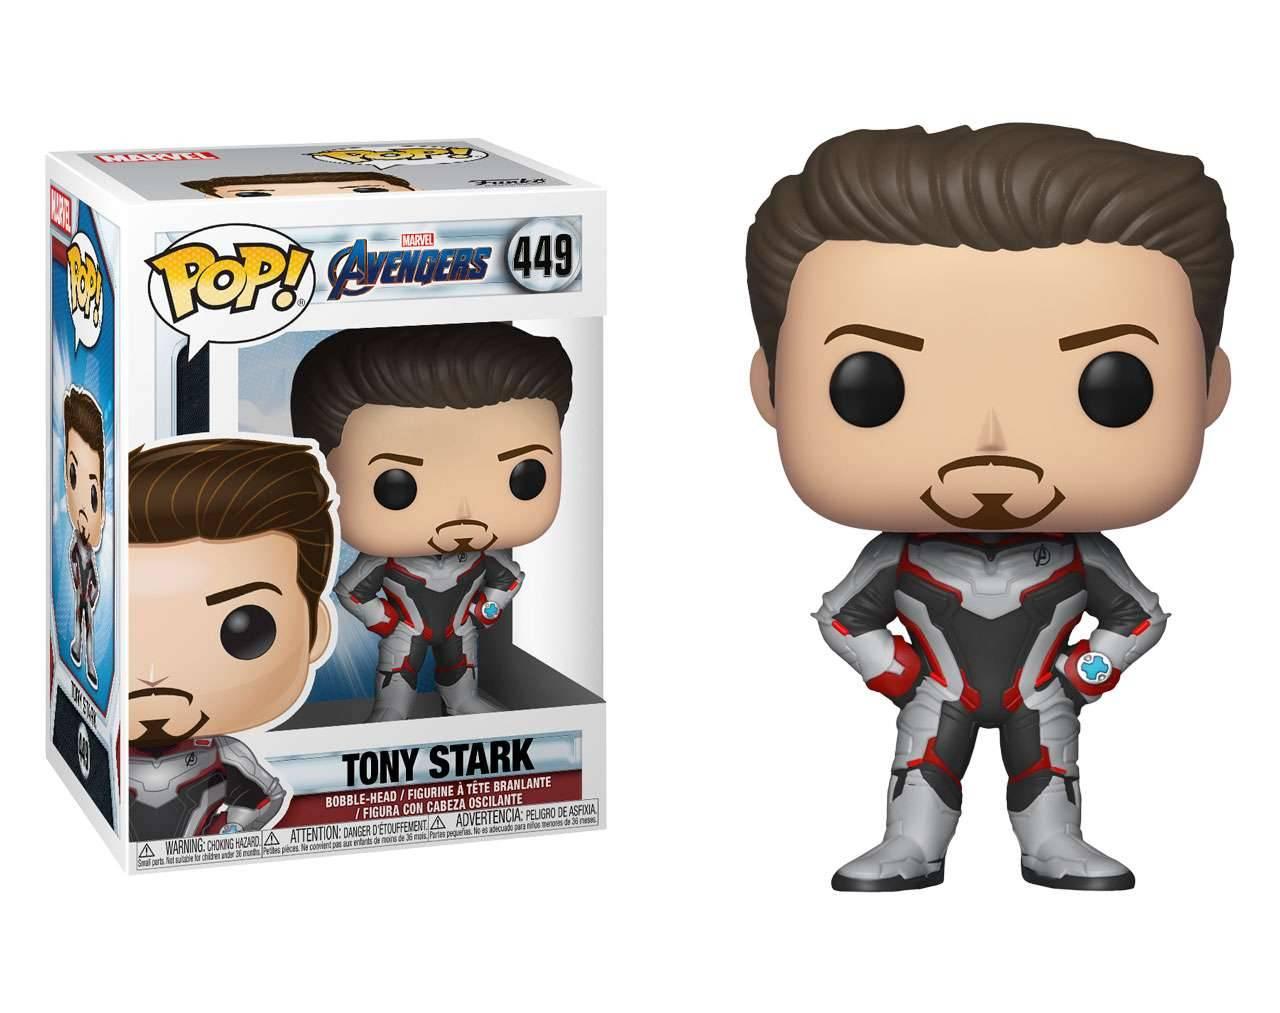 Tony Stark (Endgame) Pop! Vinyl